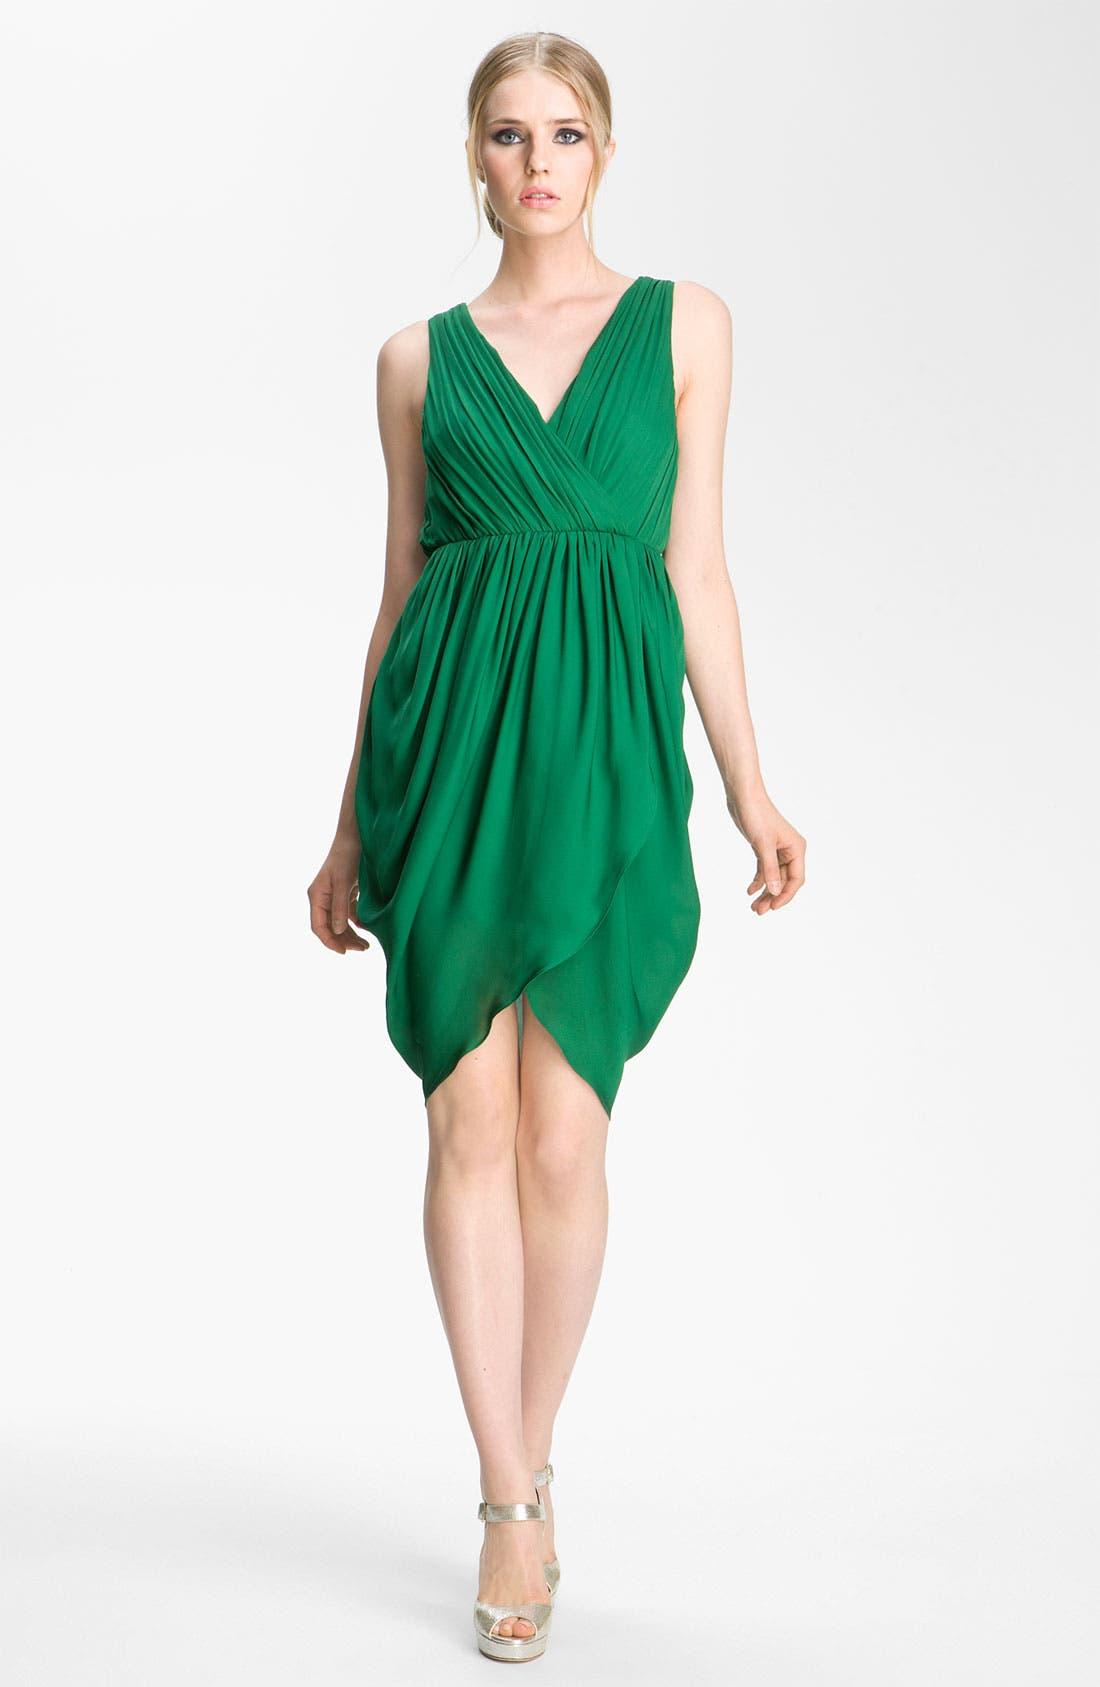 Alternate Image 1 Selected - Alice + Olivia 'Marielle' Draped Silk Sleeveless Dress